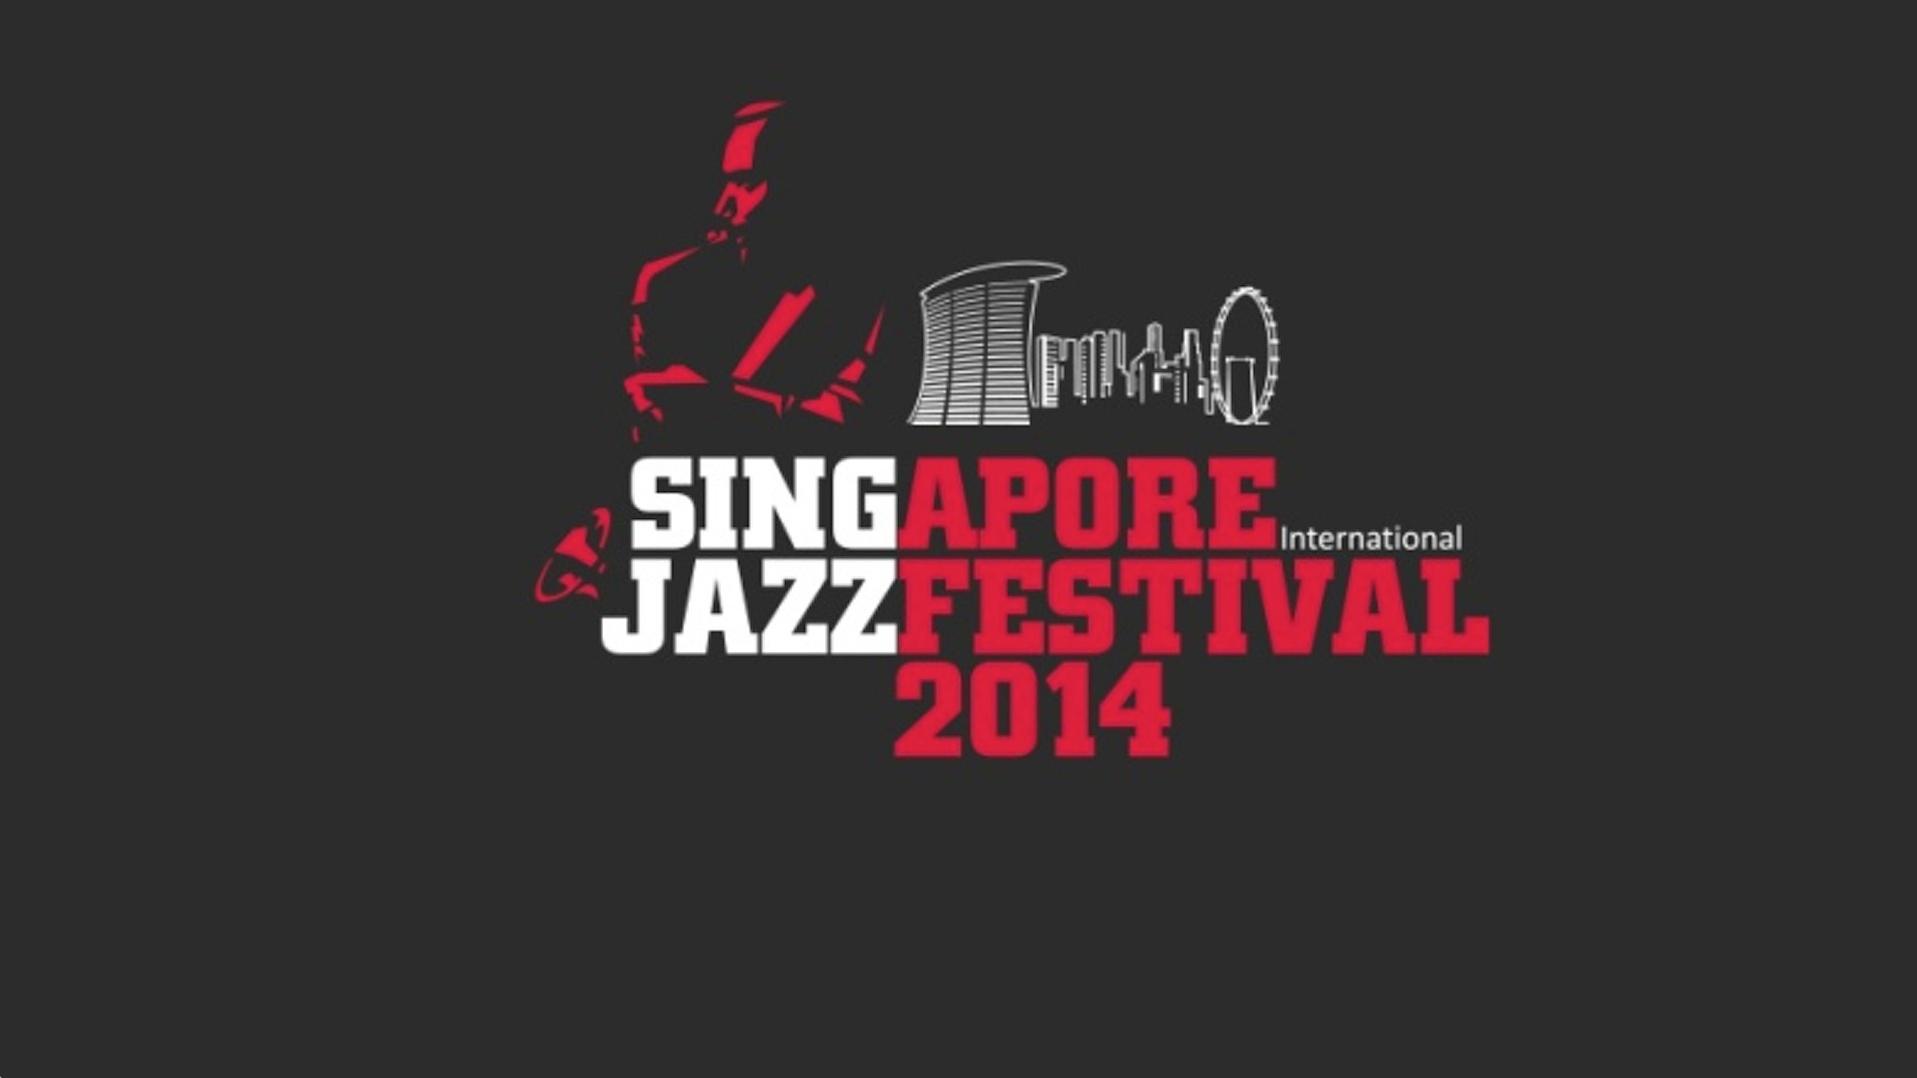 Singapore International Jazz Festival (Day 1)